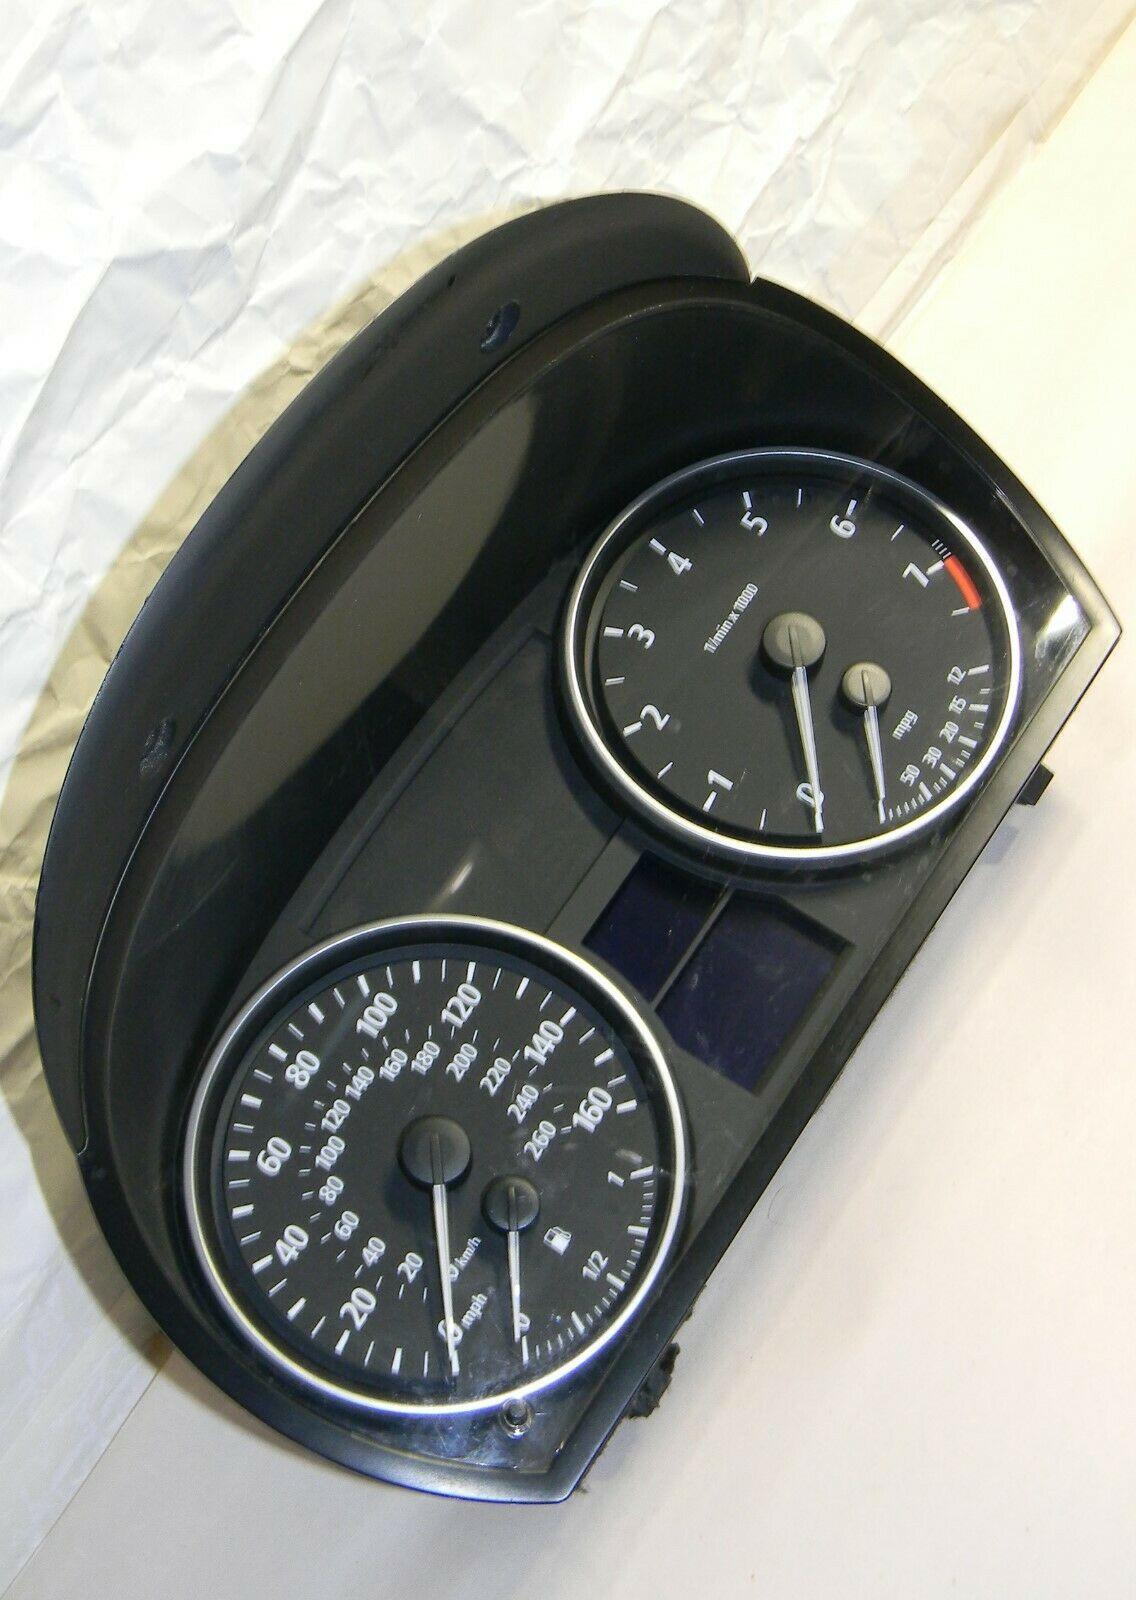 BMW E84 E90 E91 E92 E93 325i 325xi 328i 330i 335i X1 Instrument Cluster Combo - $146.98